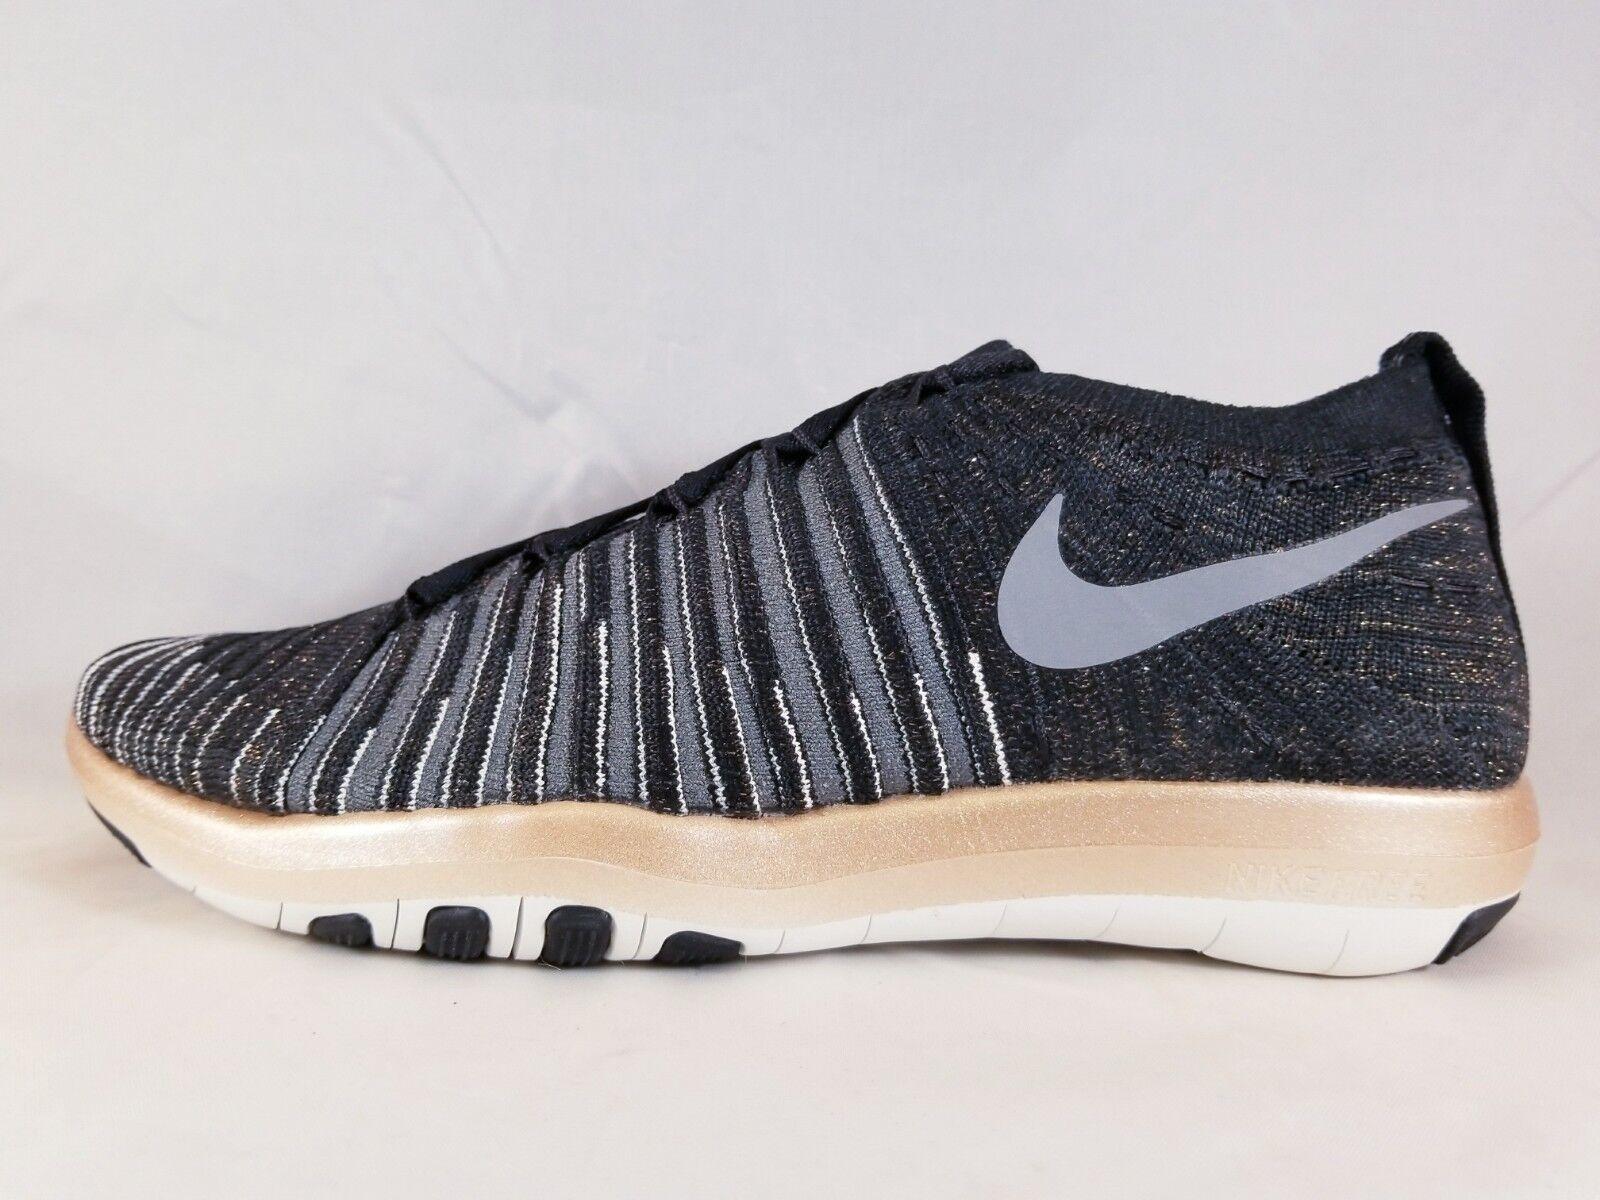 Nike Free Transform Flyknit Women's Running Shoe 833410 005 Size 5